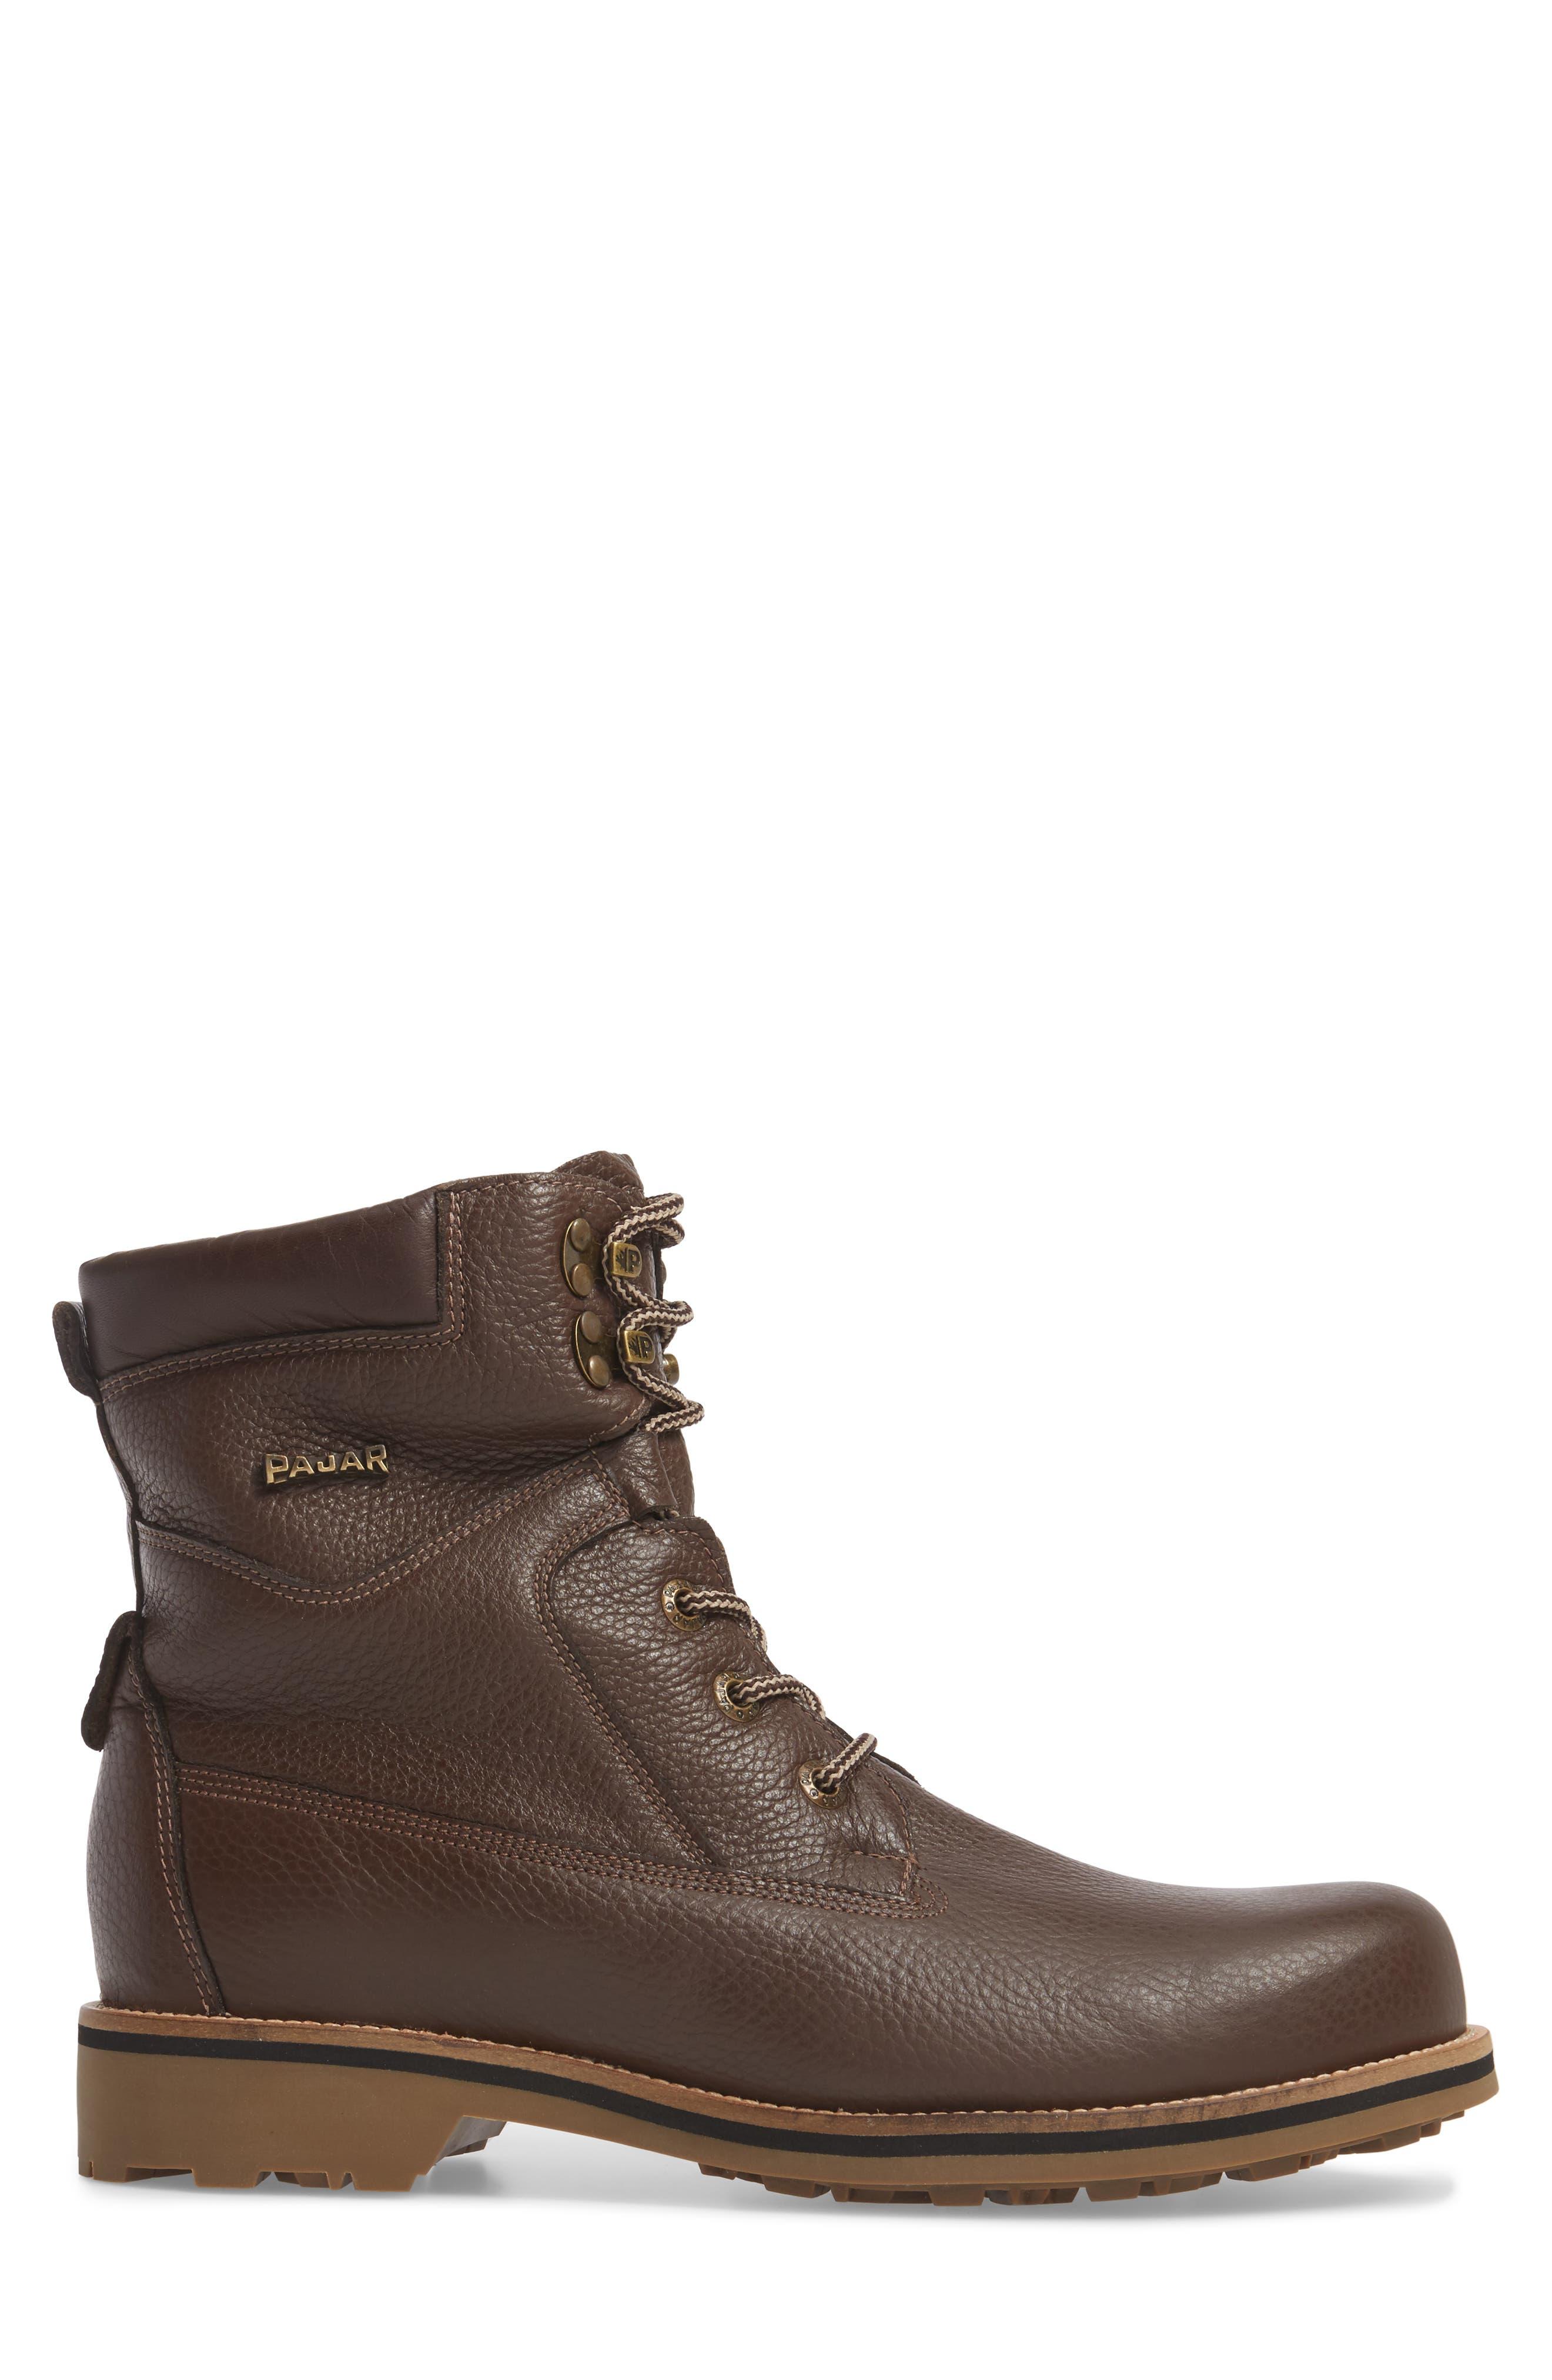 David Plain Toe Boot,                             Alternate thumbnail 3, color,                             Chocolate Leather